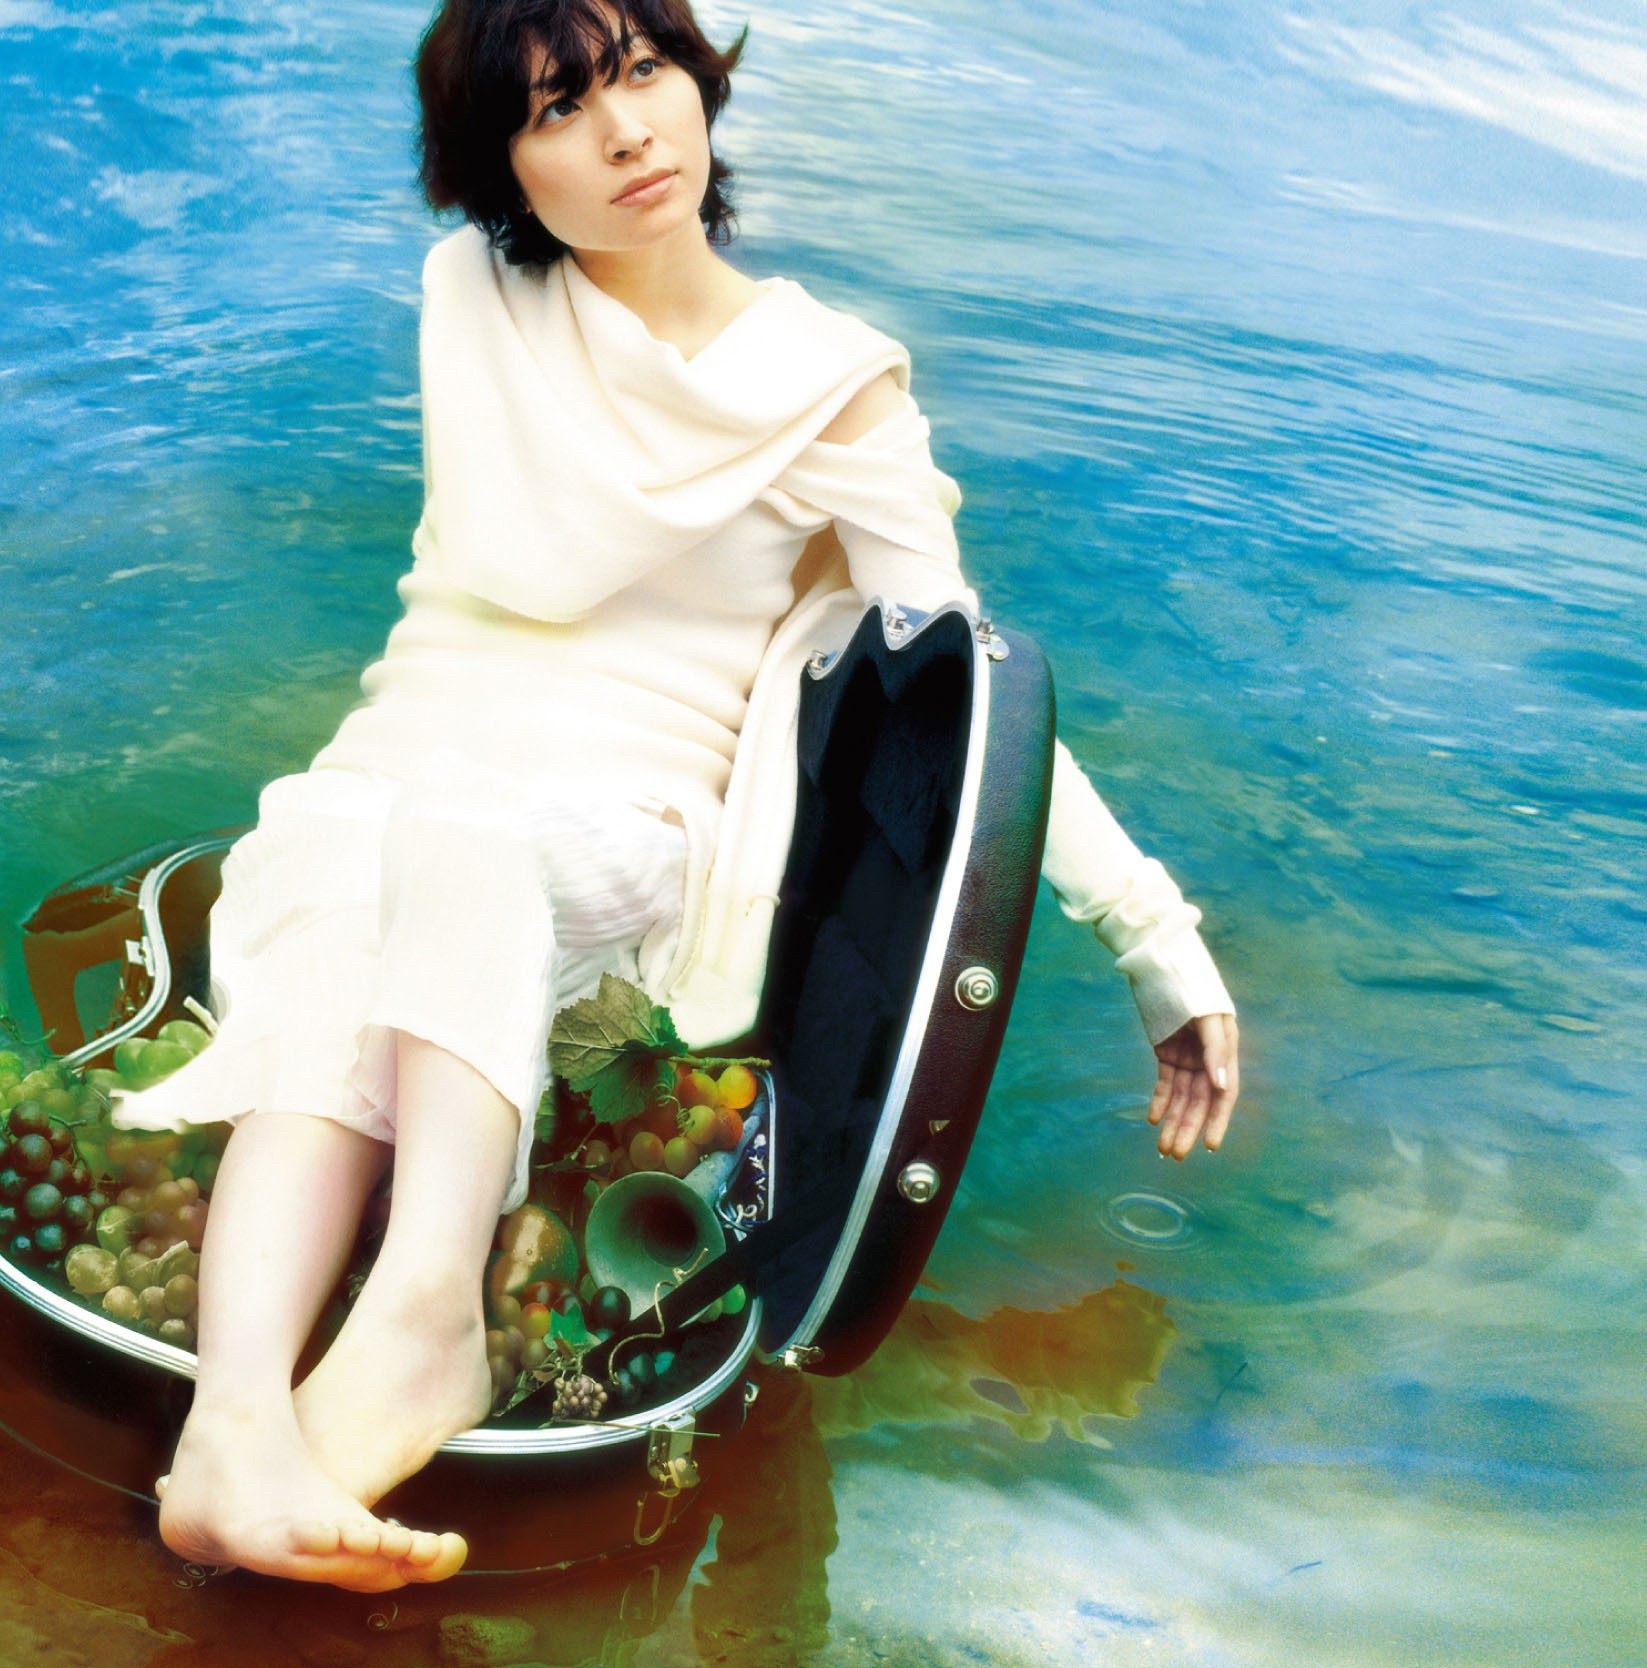 坂本真綾 (Maaya Sakamoto) – 夕凪LOOP [Mora FLAC 24bit/96kHz]